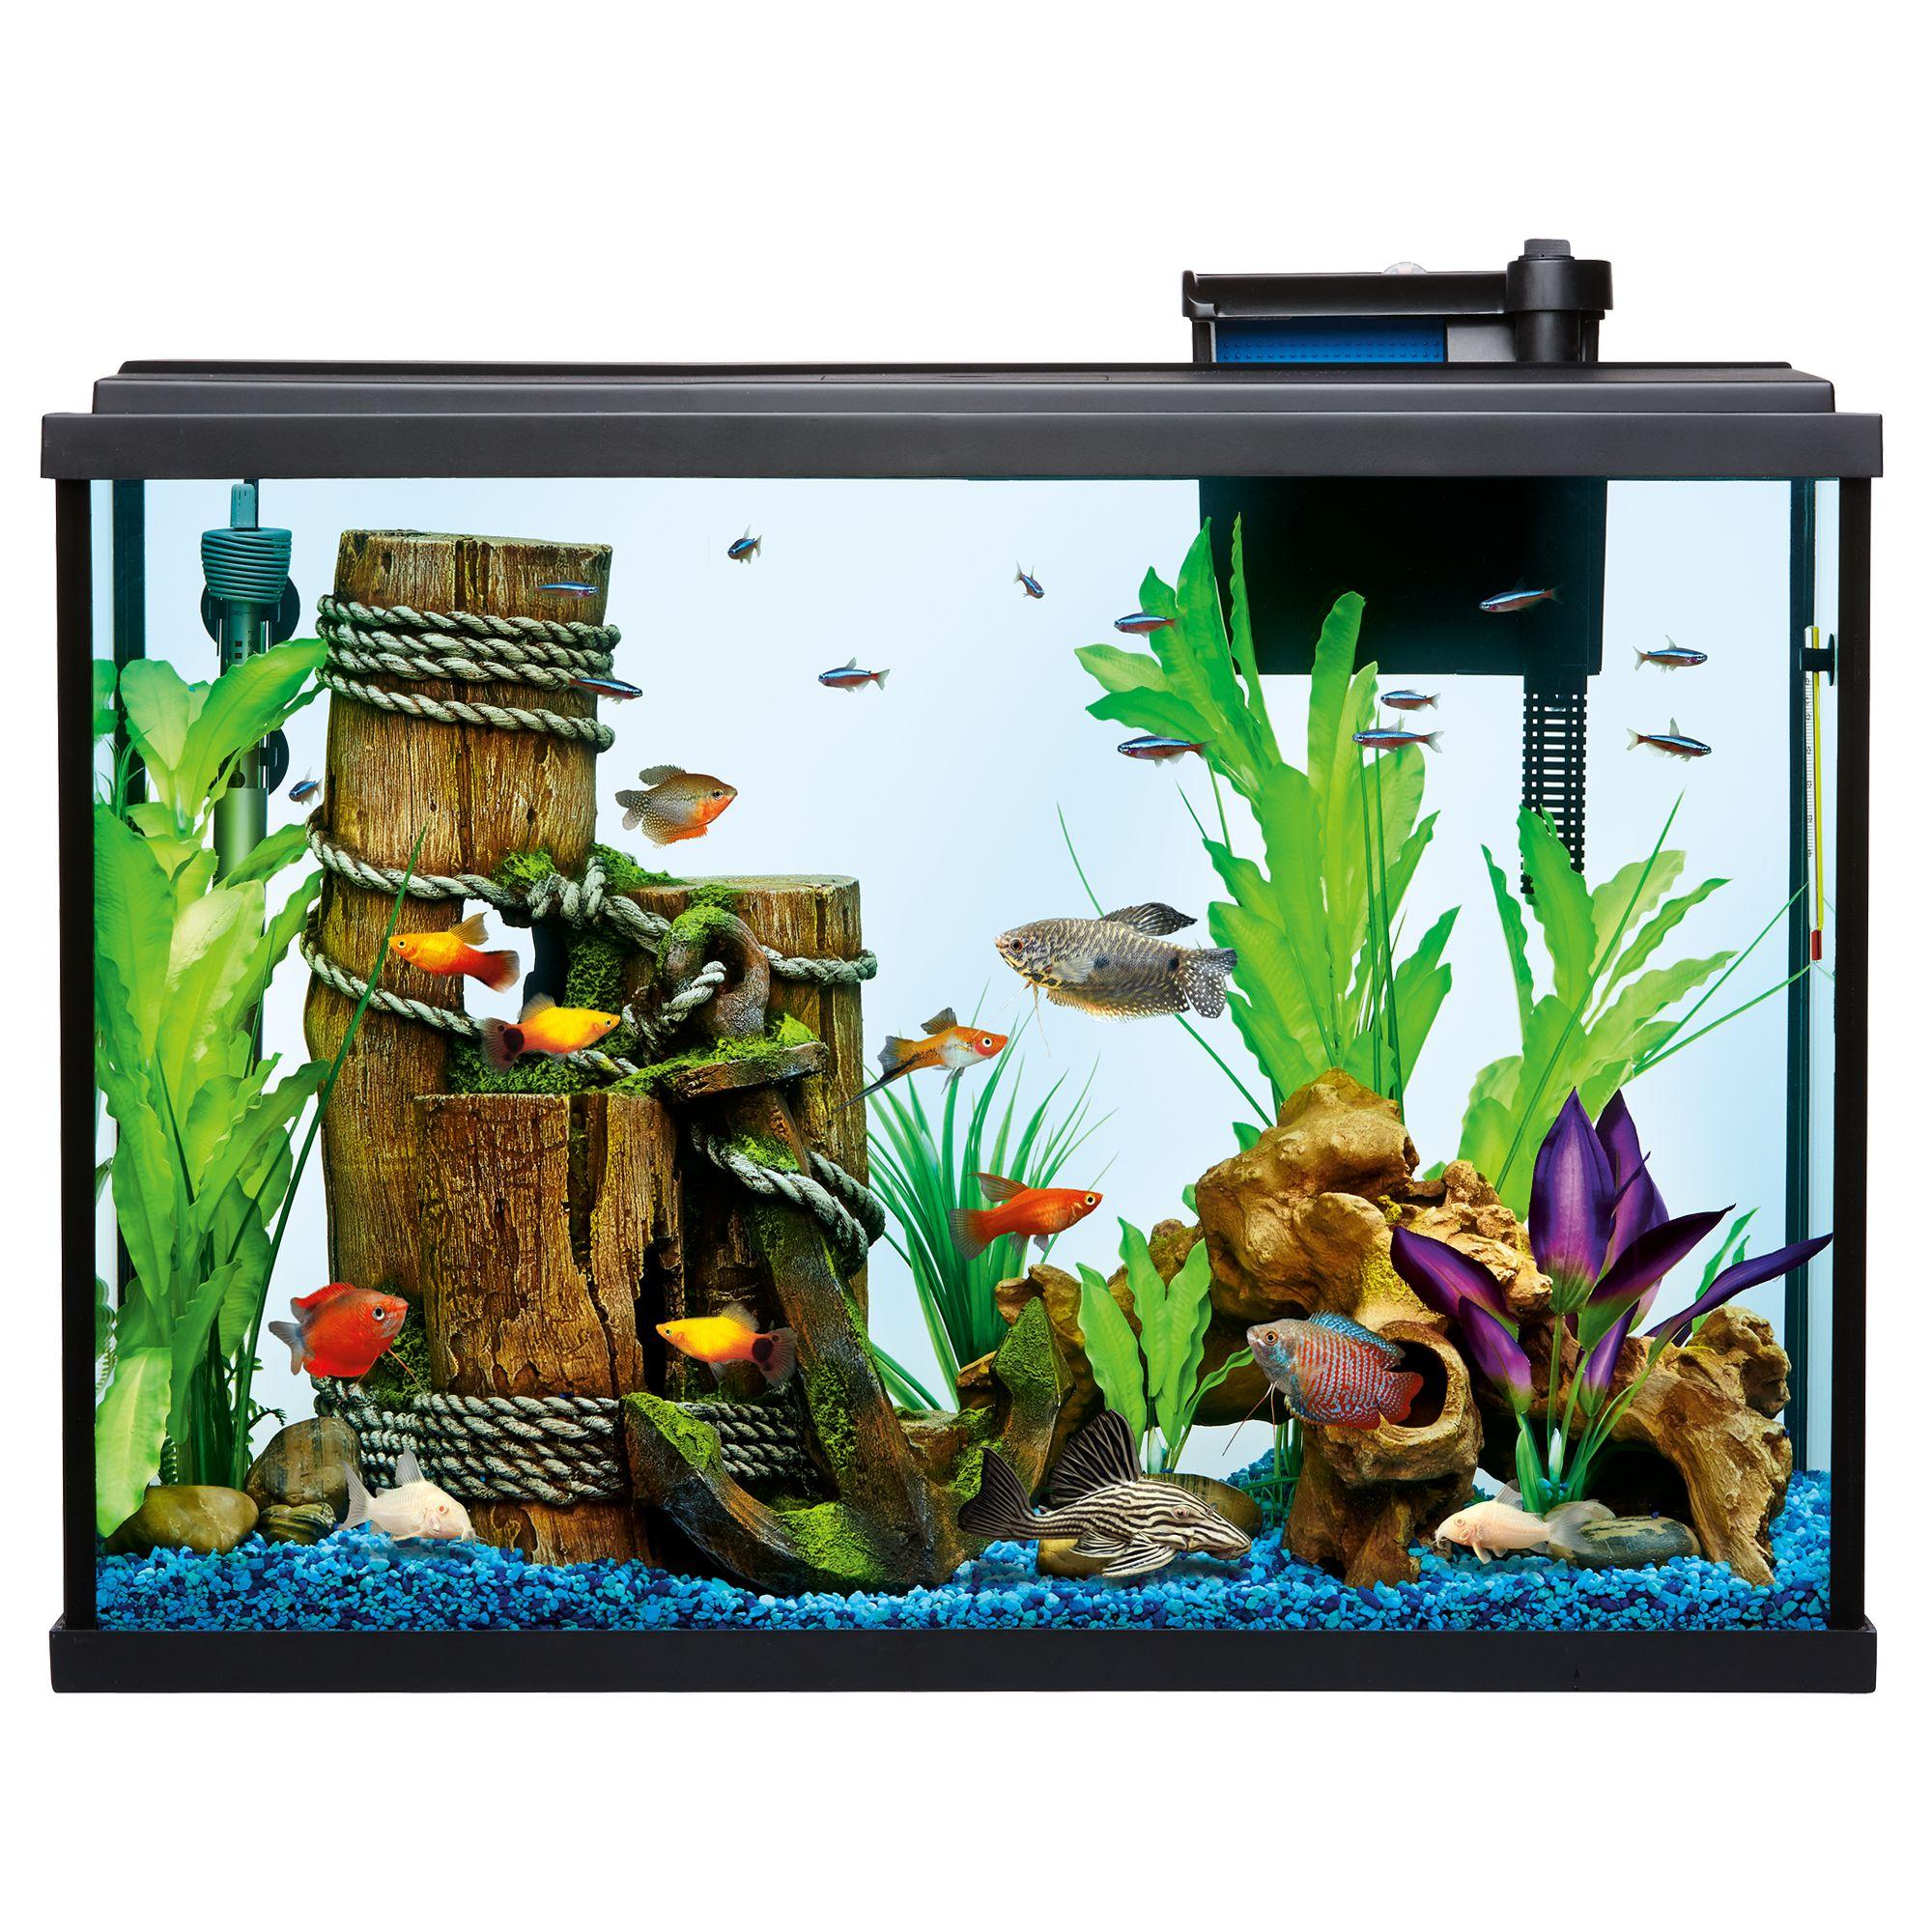 Gallon aquarium usa for 37 gallon fish tank